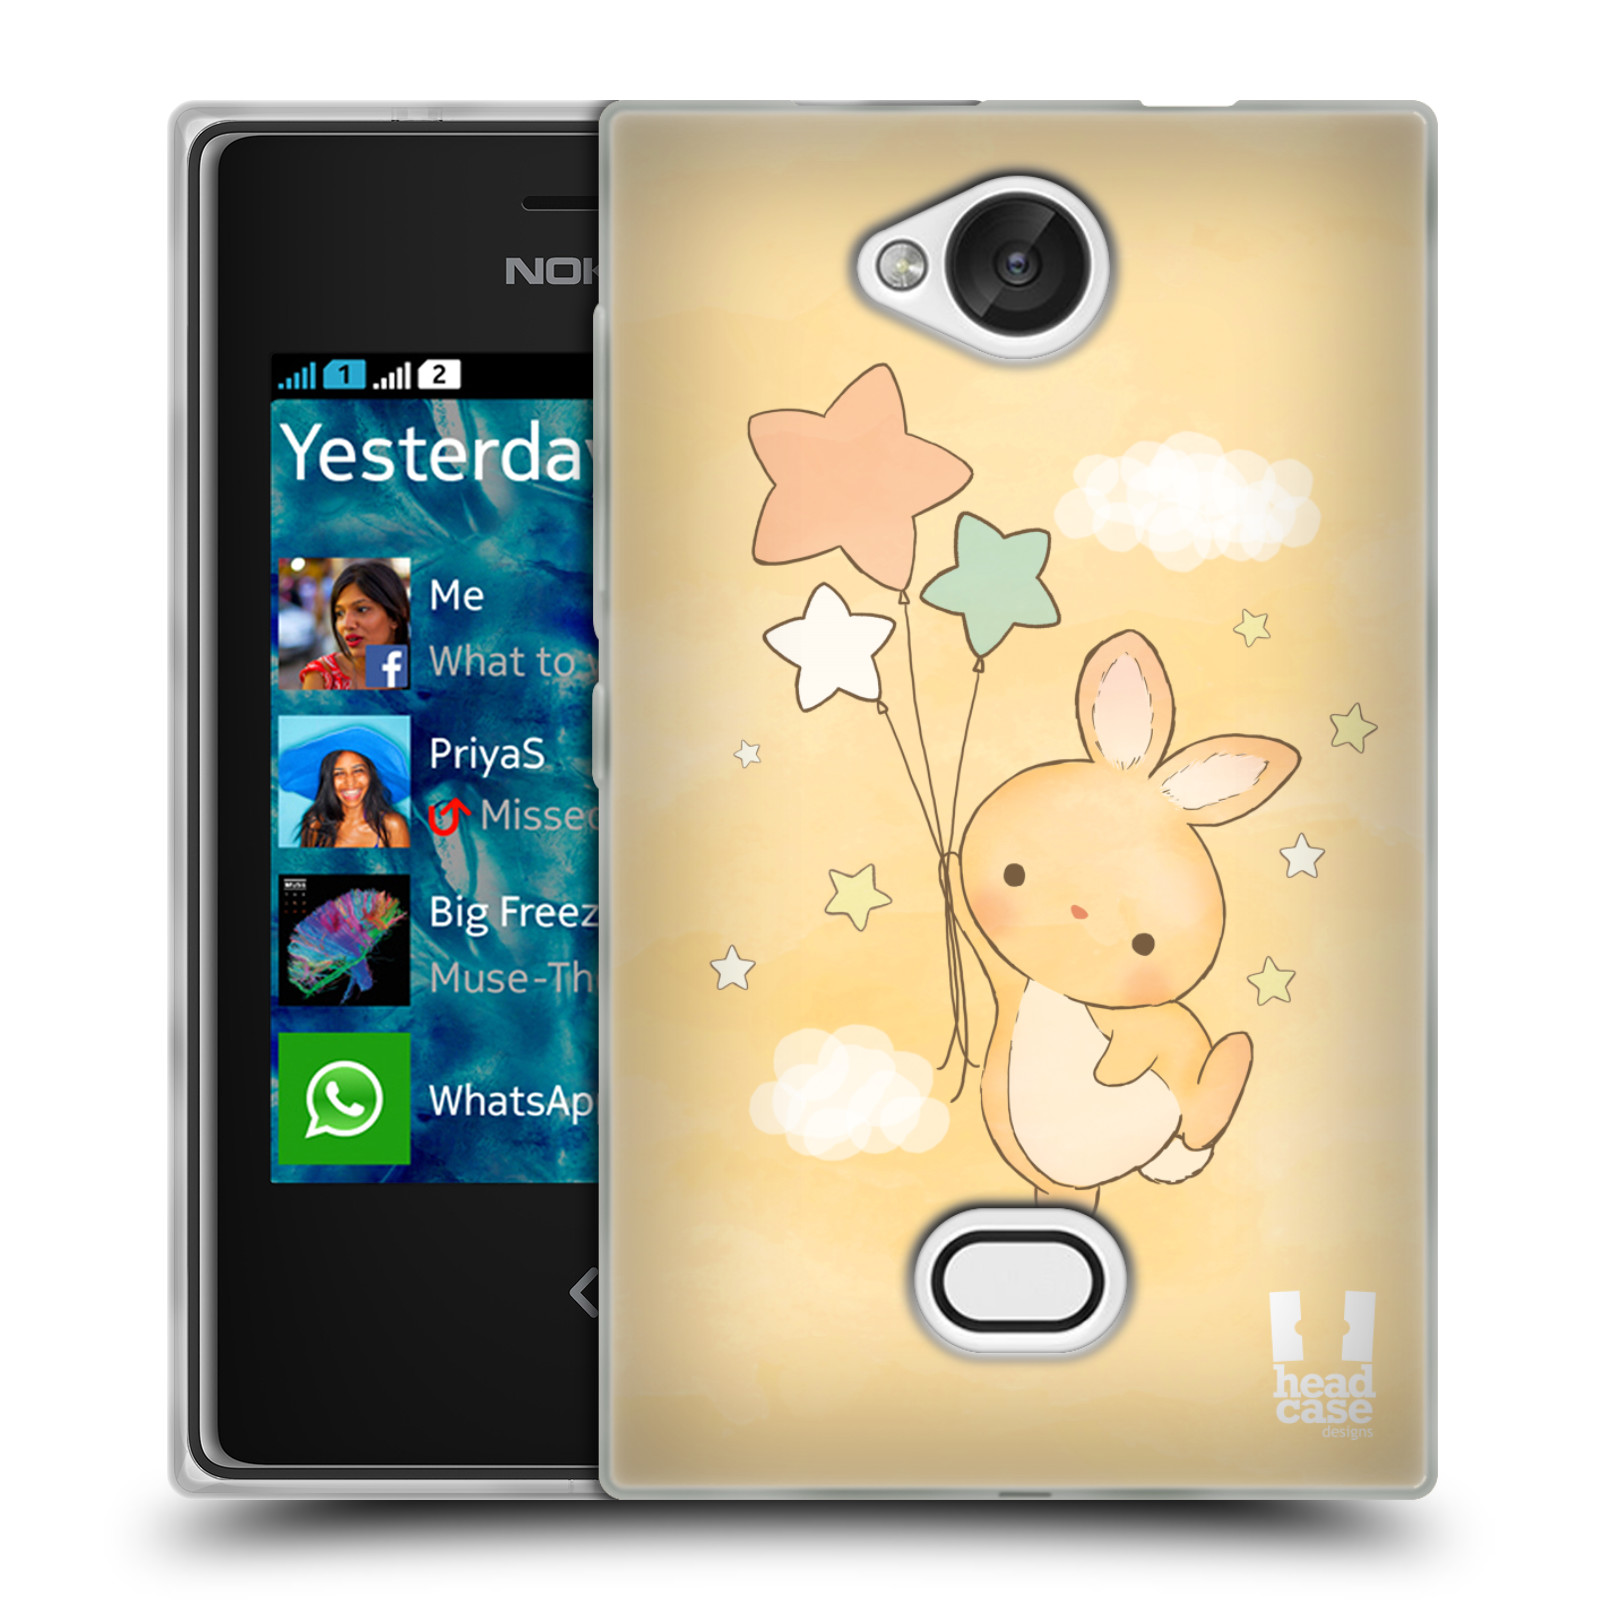 HEAD CASE silikonový obal na mobil NOKIA Asha 503 vzor králíček a hvězdy žlutá